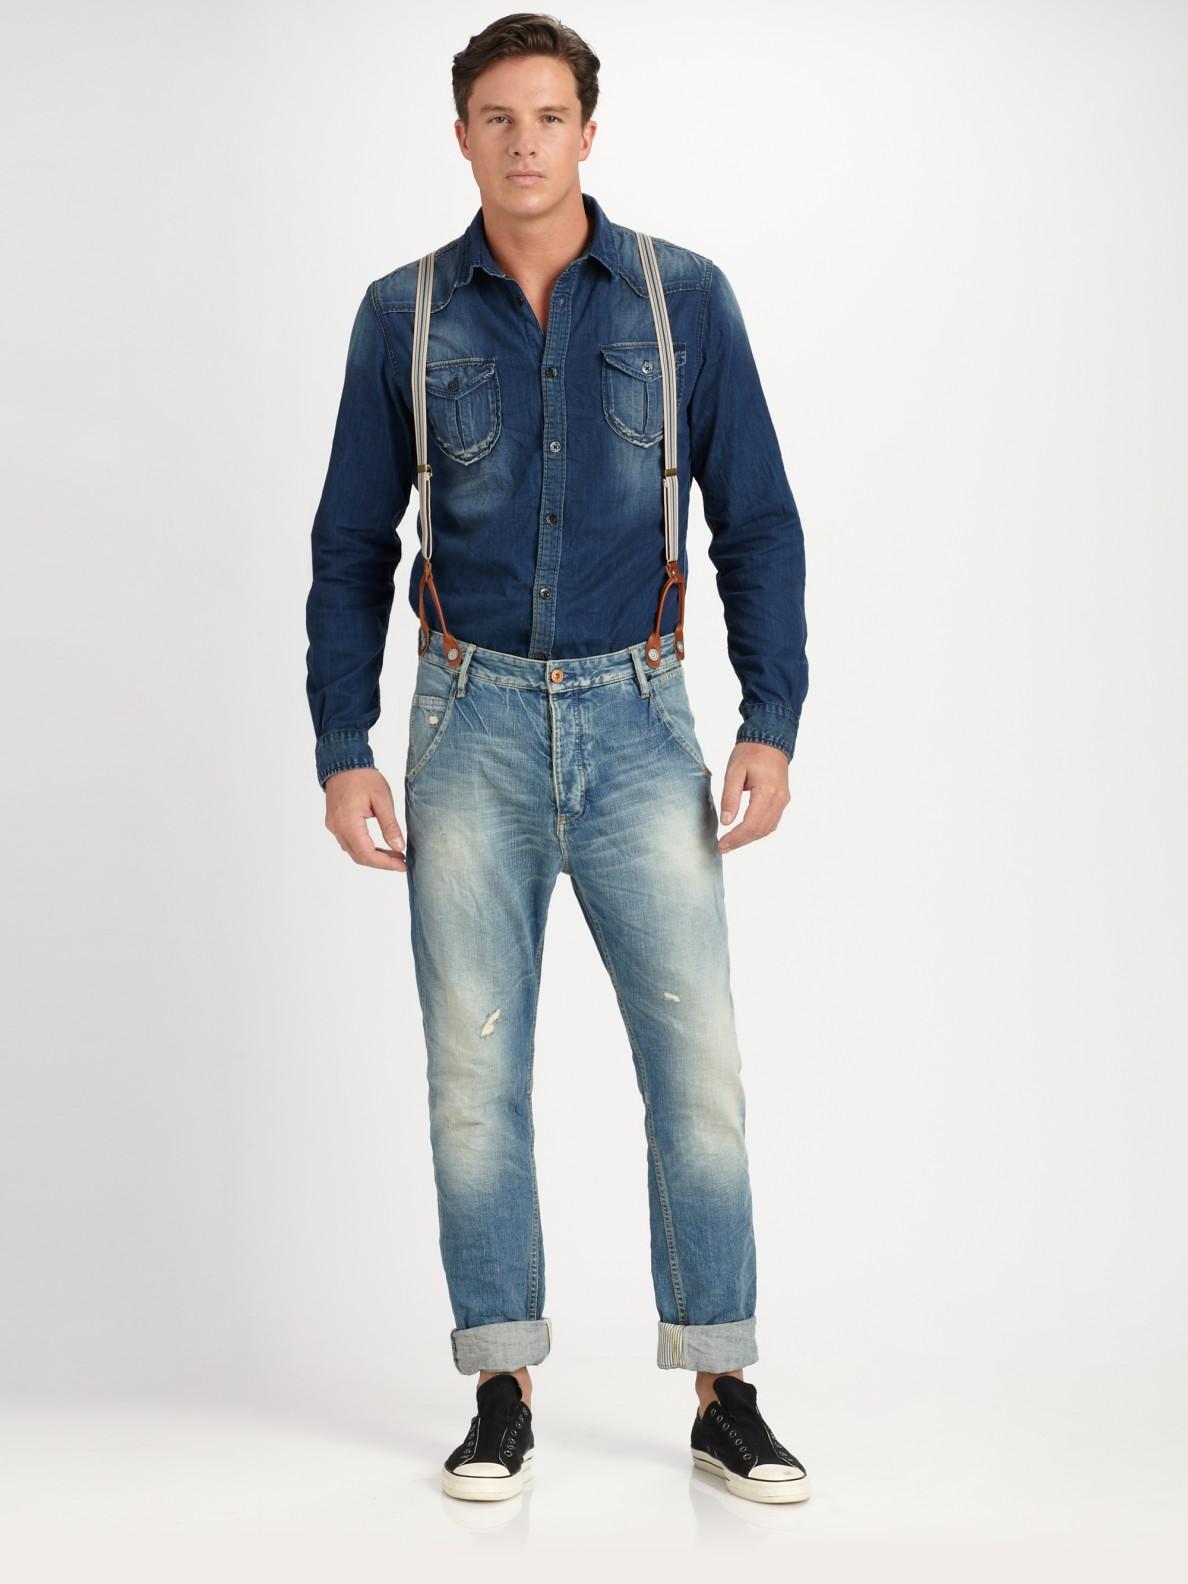 Skinny Stretch Jeans For Men